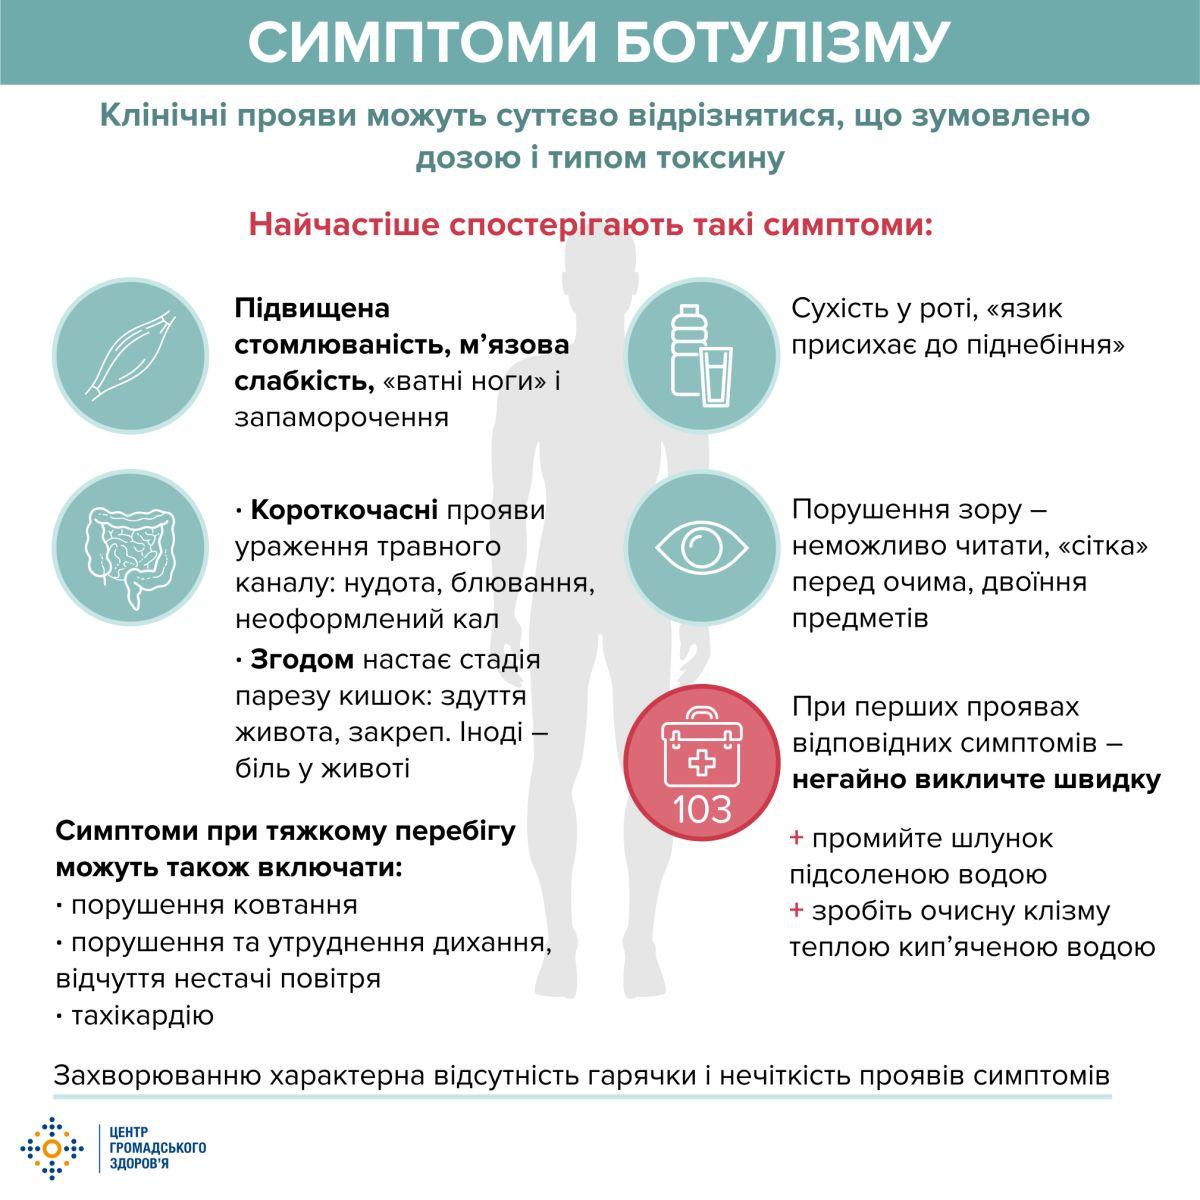 https://phc.org.ua/sites/default/files/uploads/images/botylizm4.png